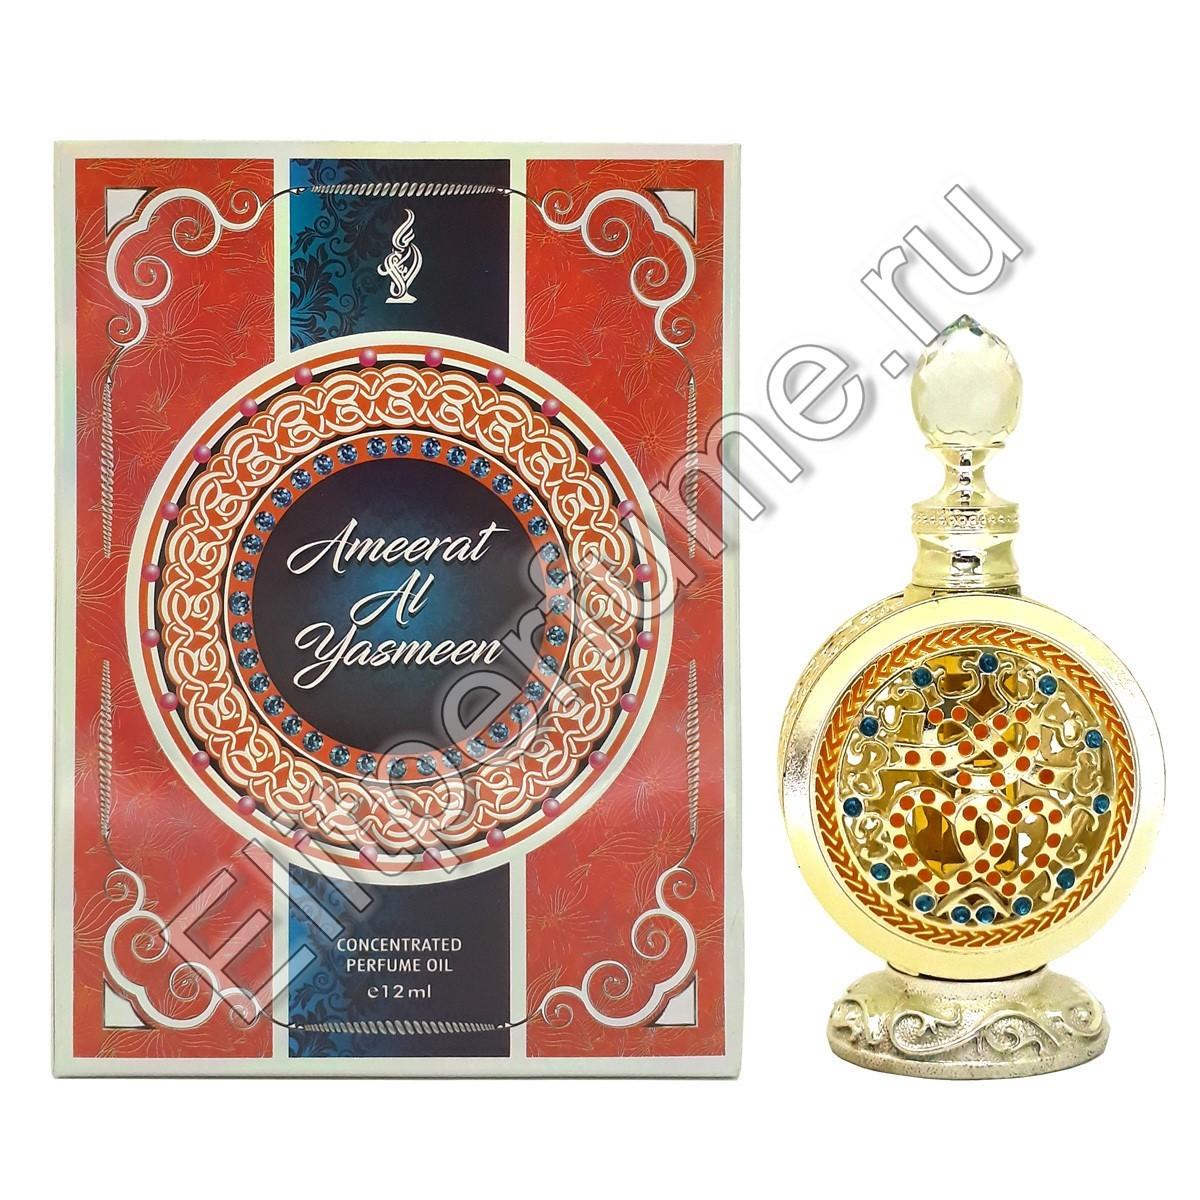 Ameerat al Yasmeen / Амират аль Асмин 12 мл арабские масляные духи от Халис Khalis Perfumes